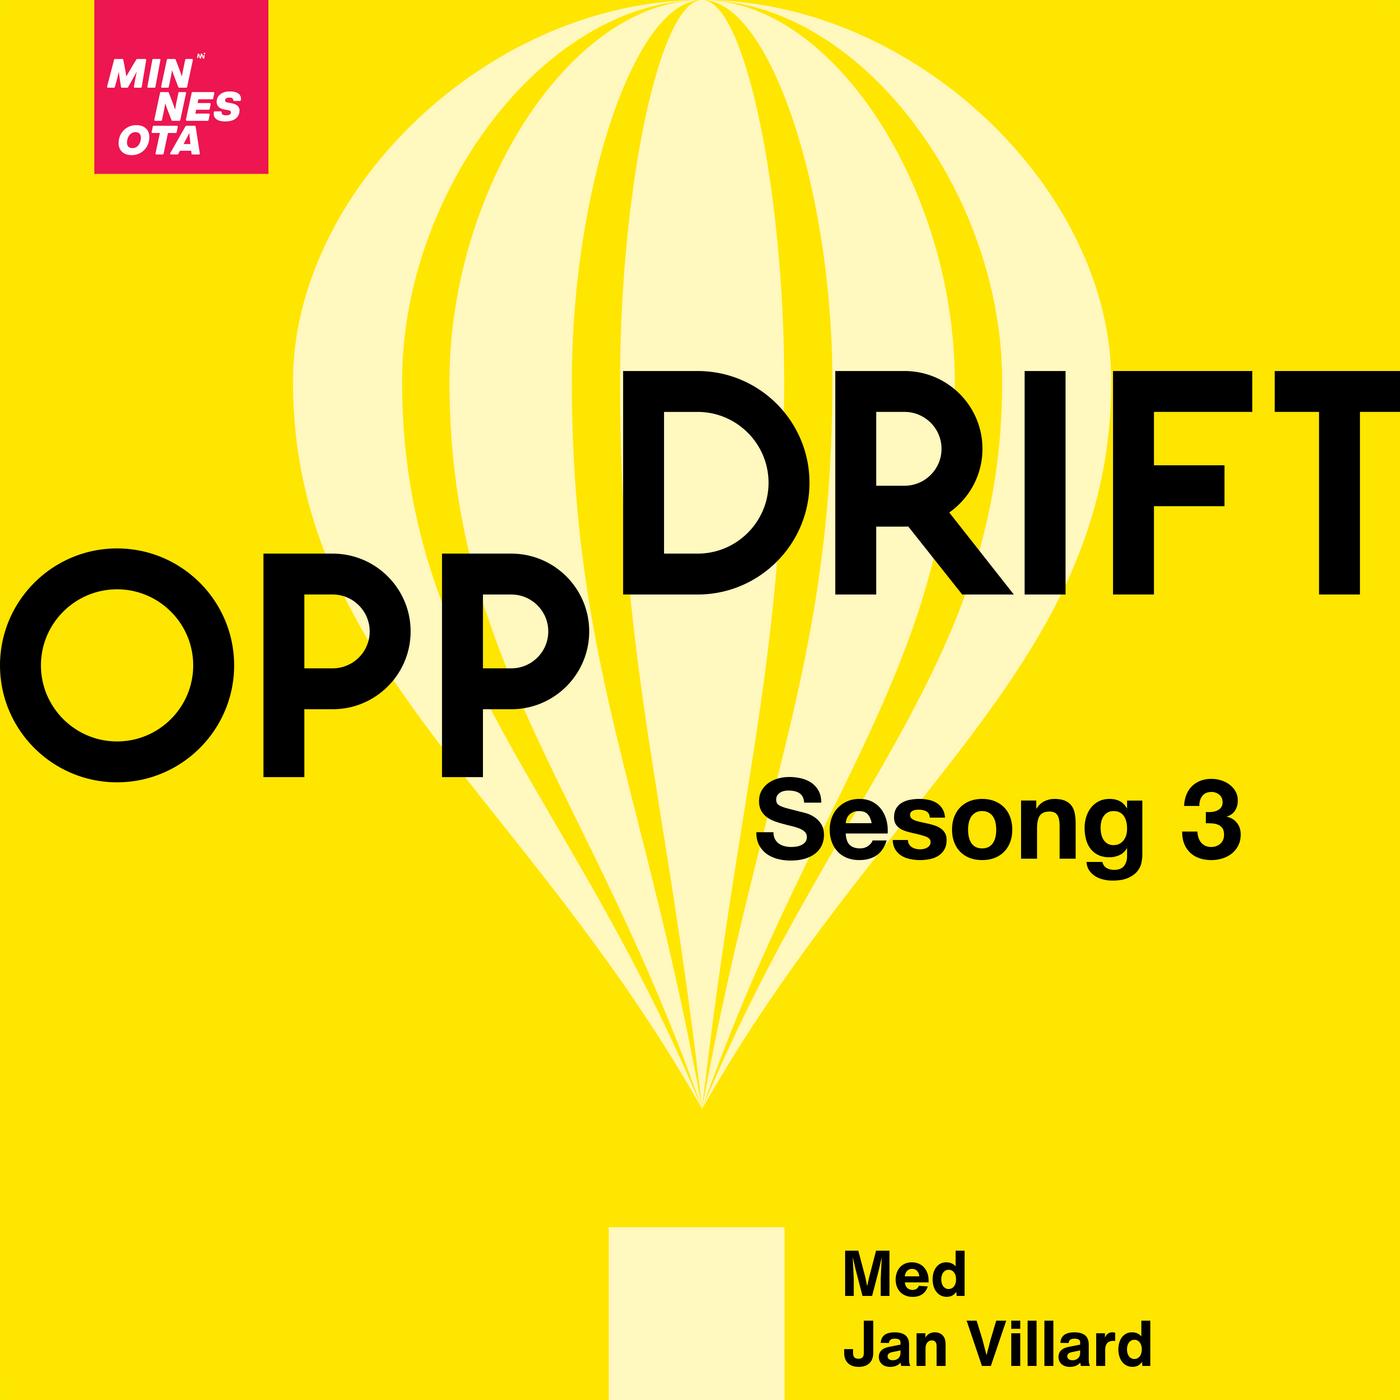 Eric Sandtrø - supergründer i fjellsport.no og komplett.no